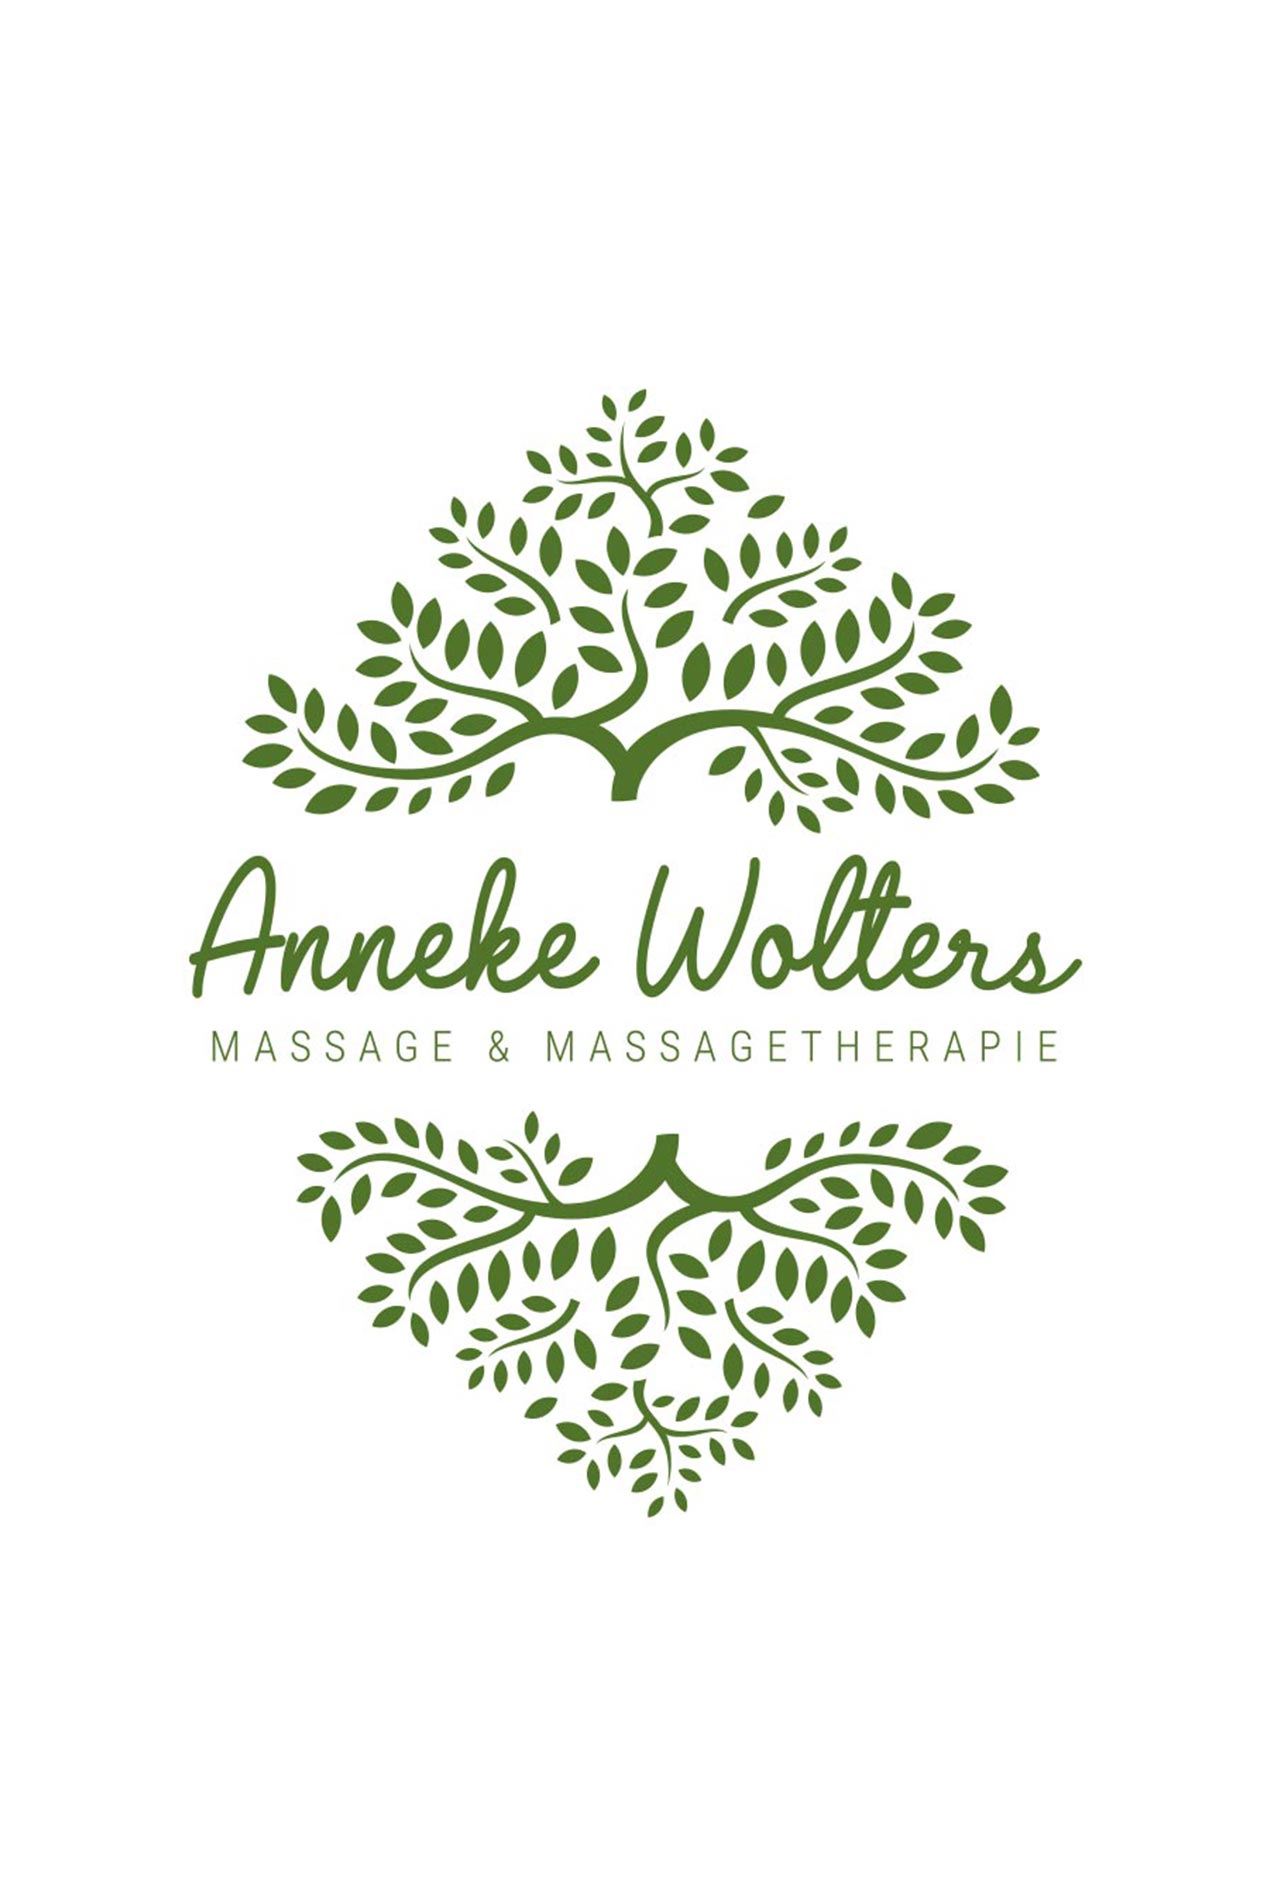 anneke-wolters.jpg